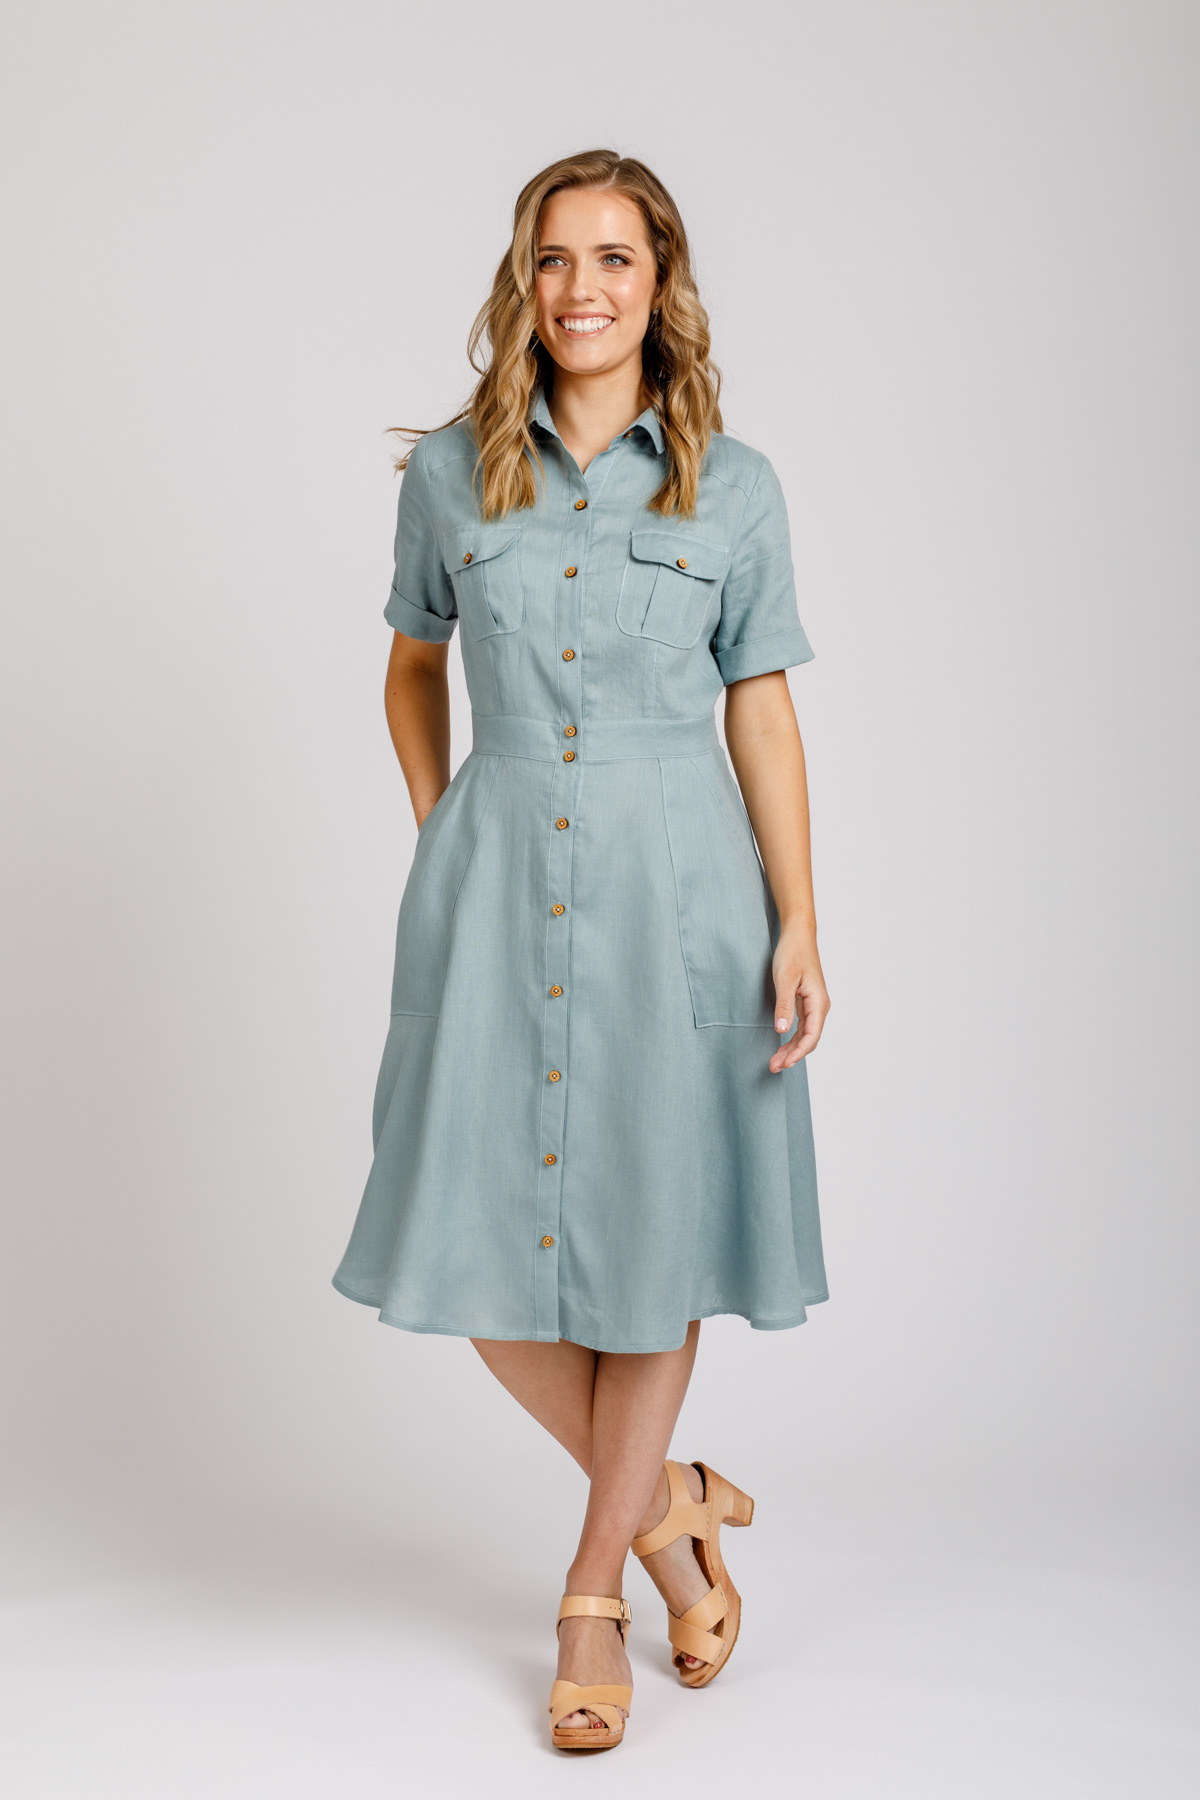 Megan Nielsen Matilda Dress View B | Sizes 0-20